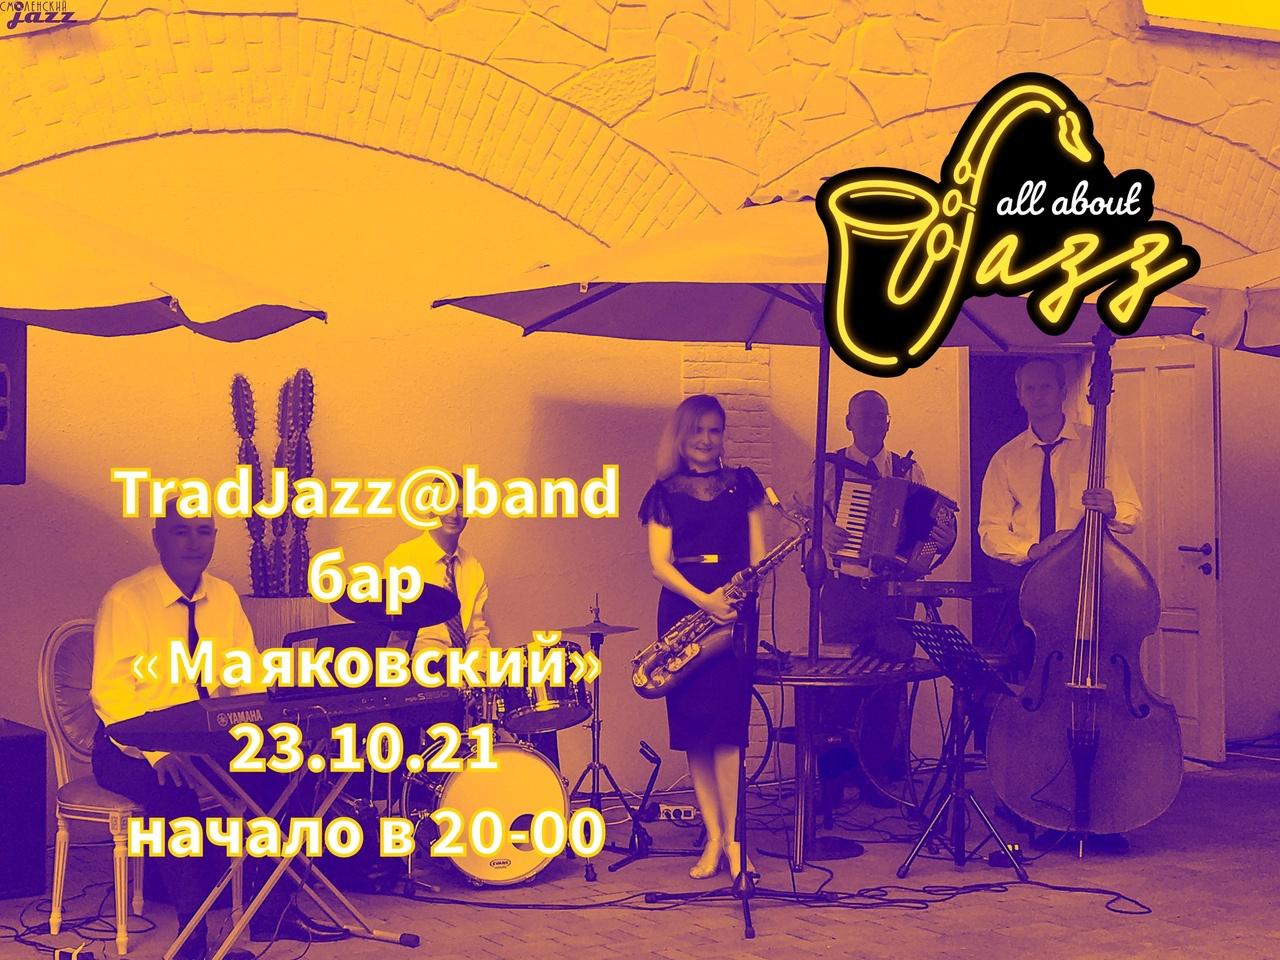 23.10 Trad Jazz Band в баре Маяковский!